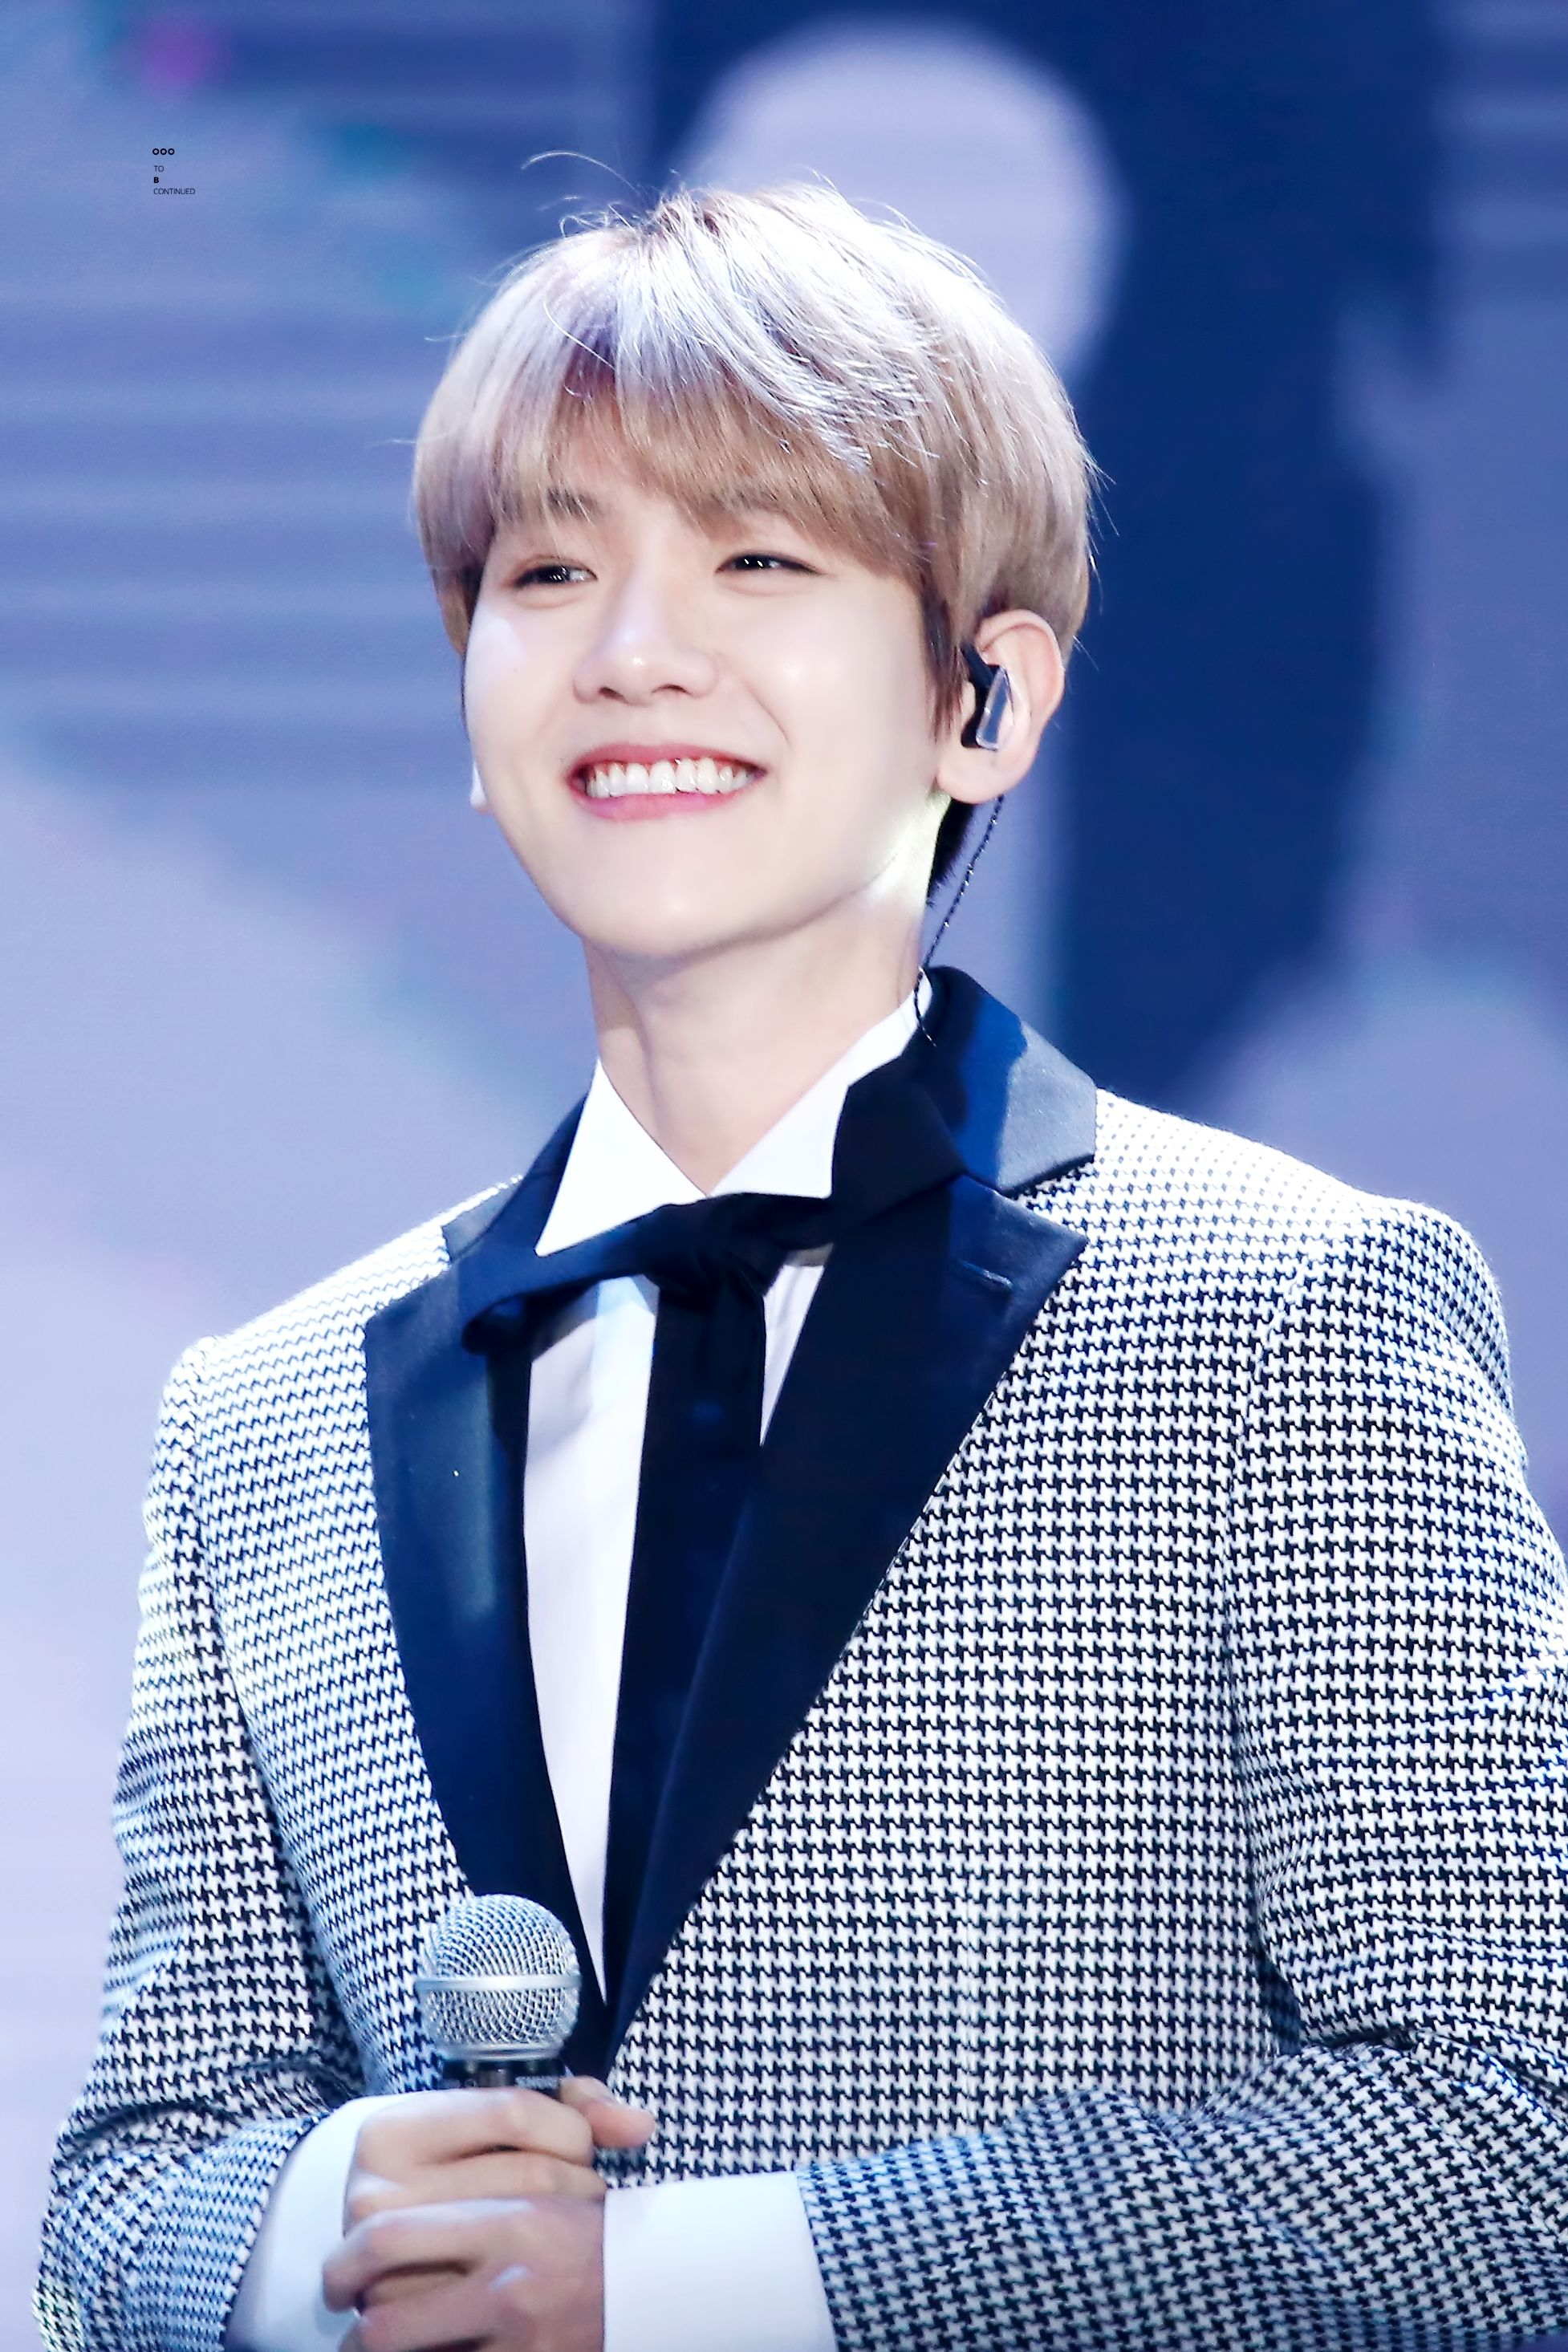 Image result for baekhyun exo smile